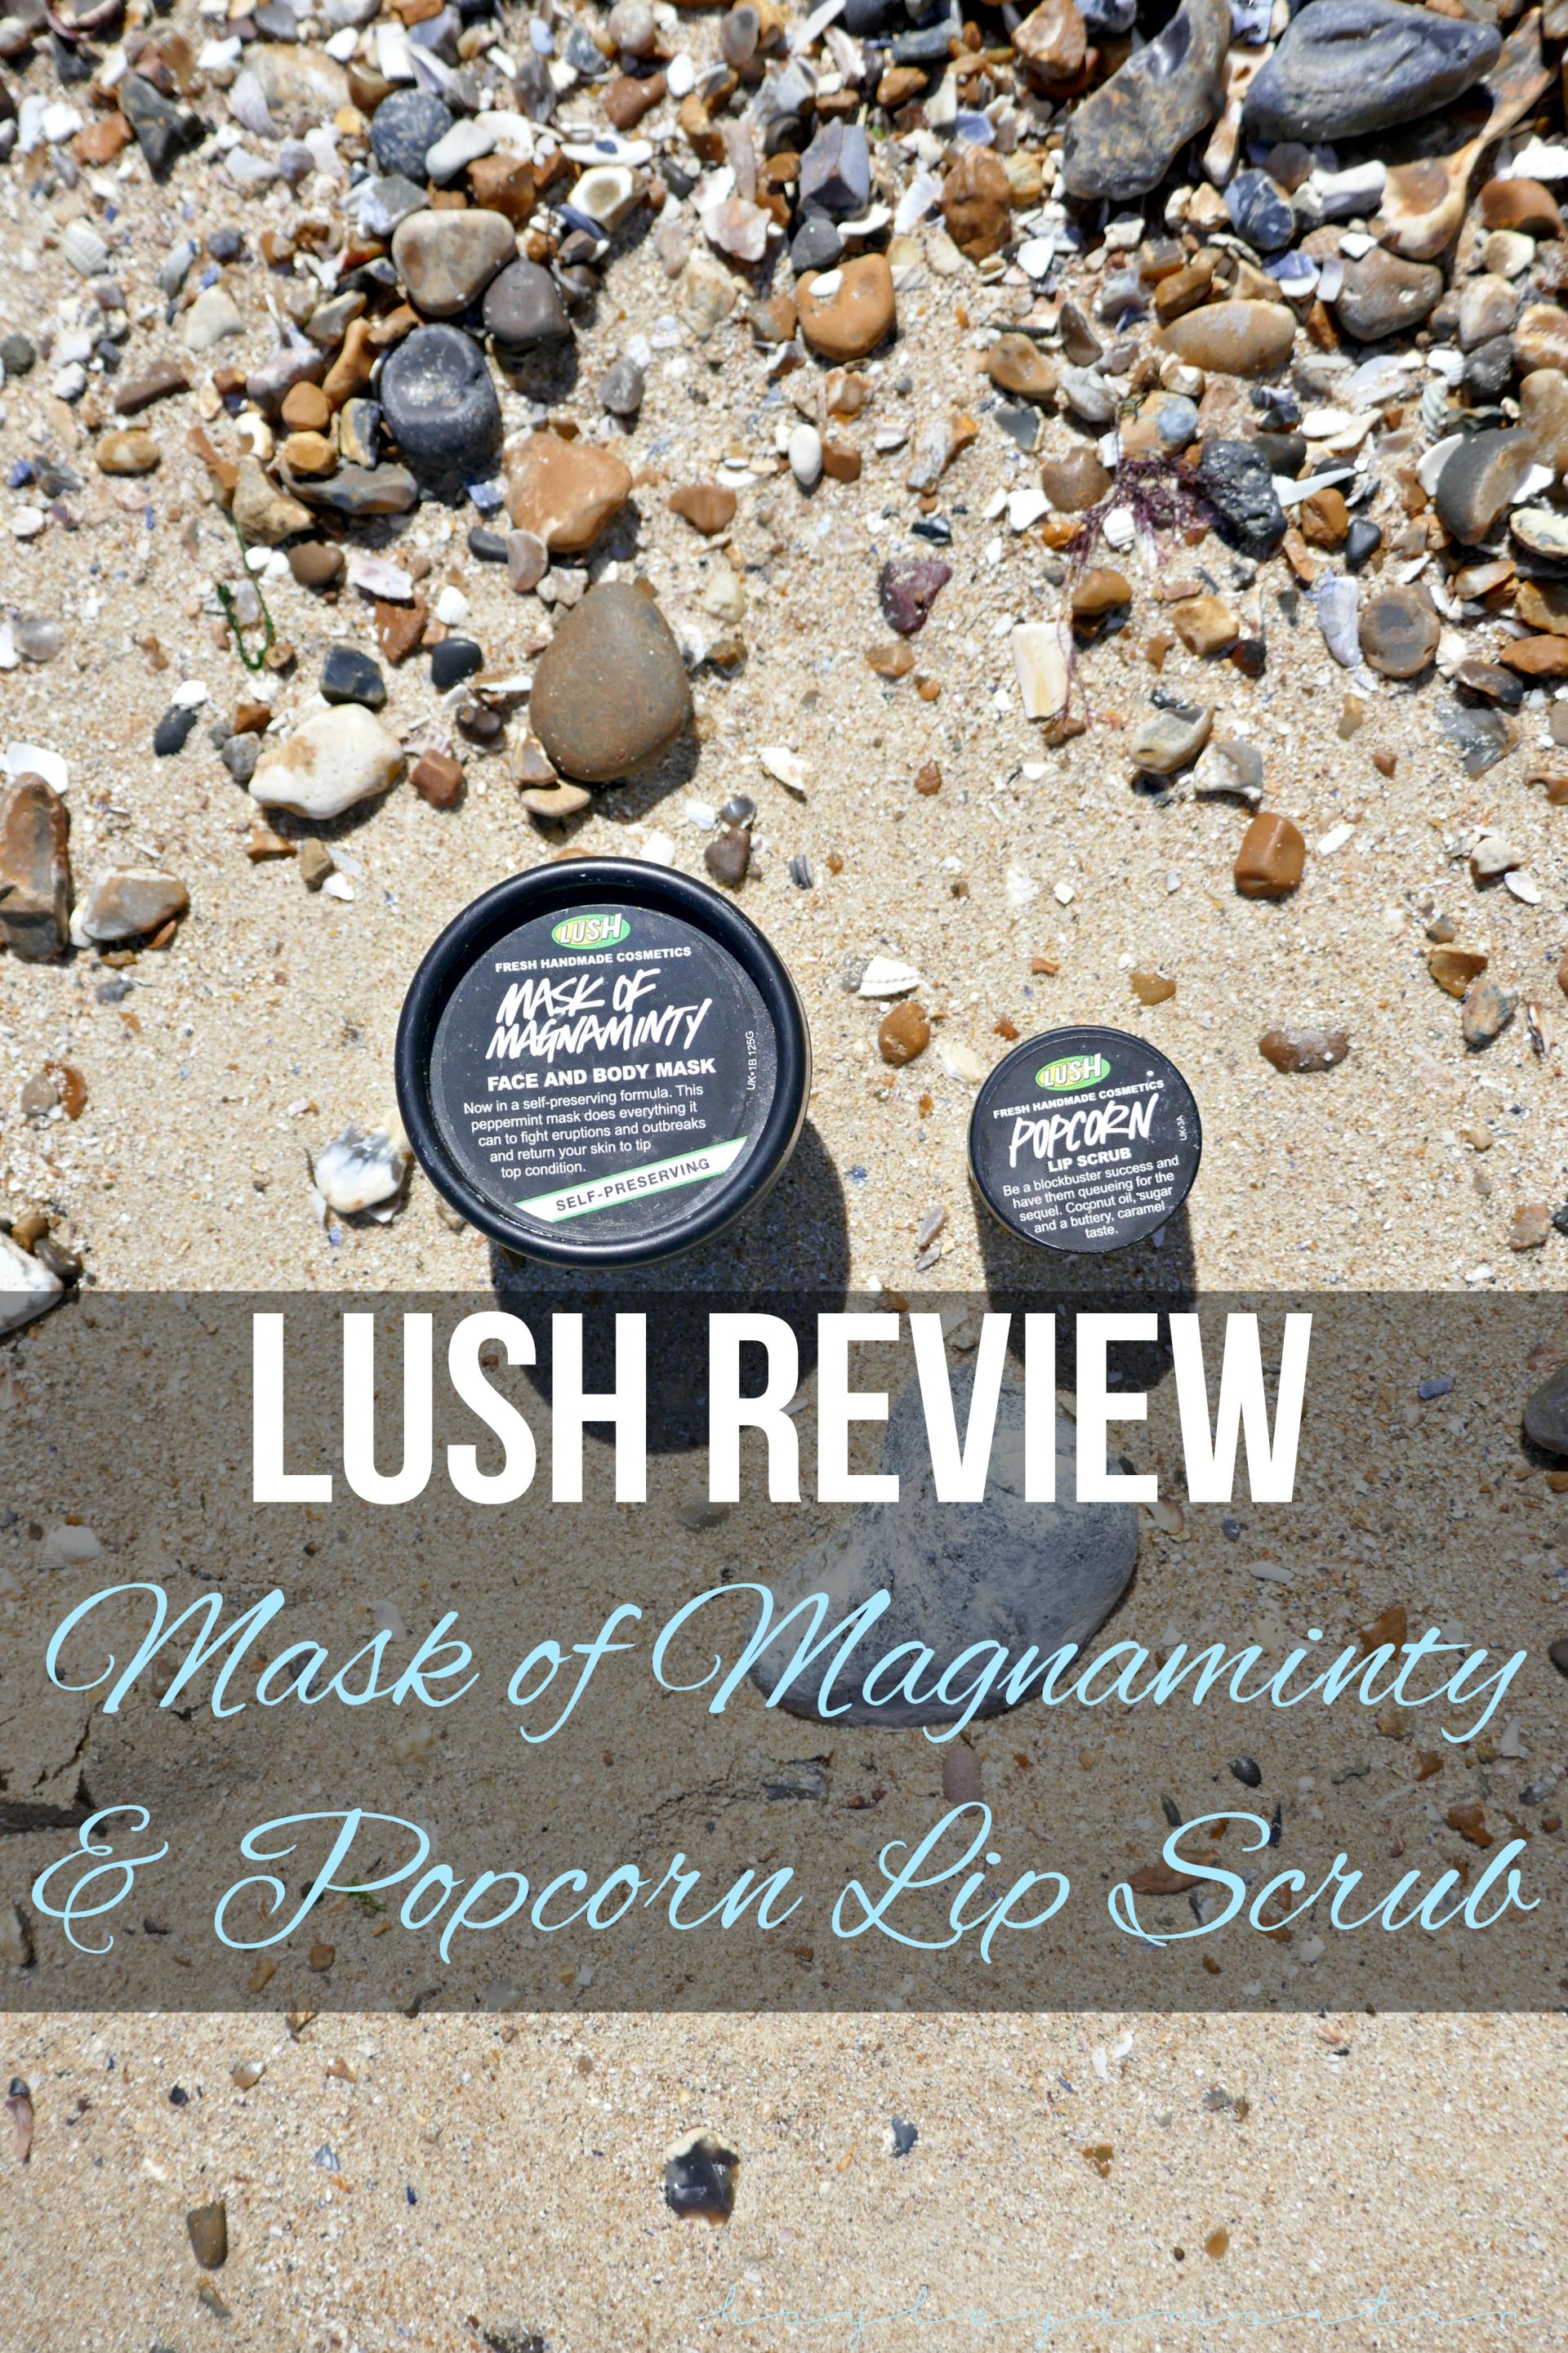 hayleyxmartin | Lush Review - Mask of Magnaminty & Popcorn Lip Scrub